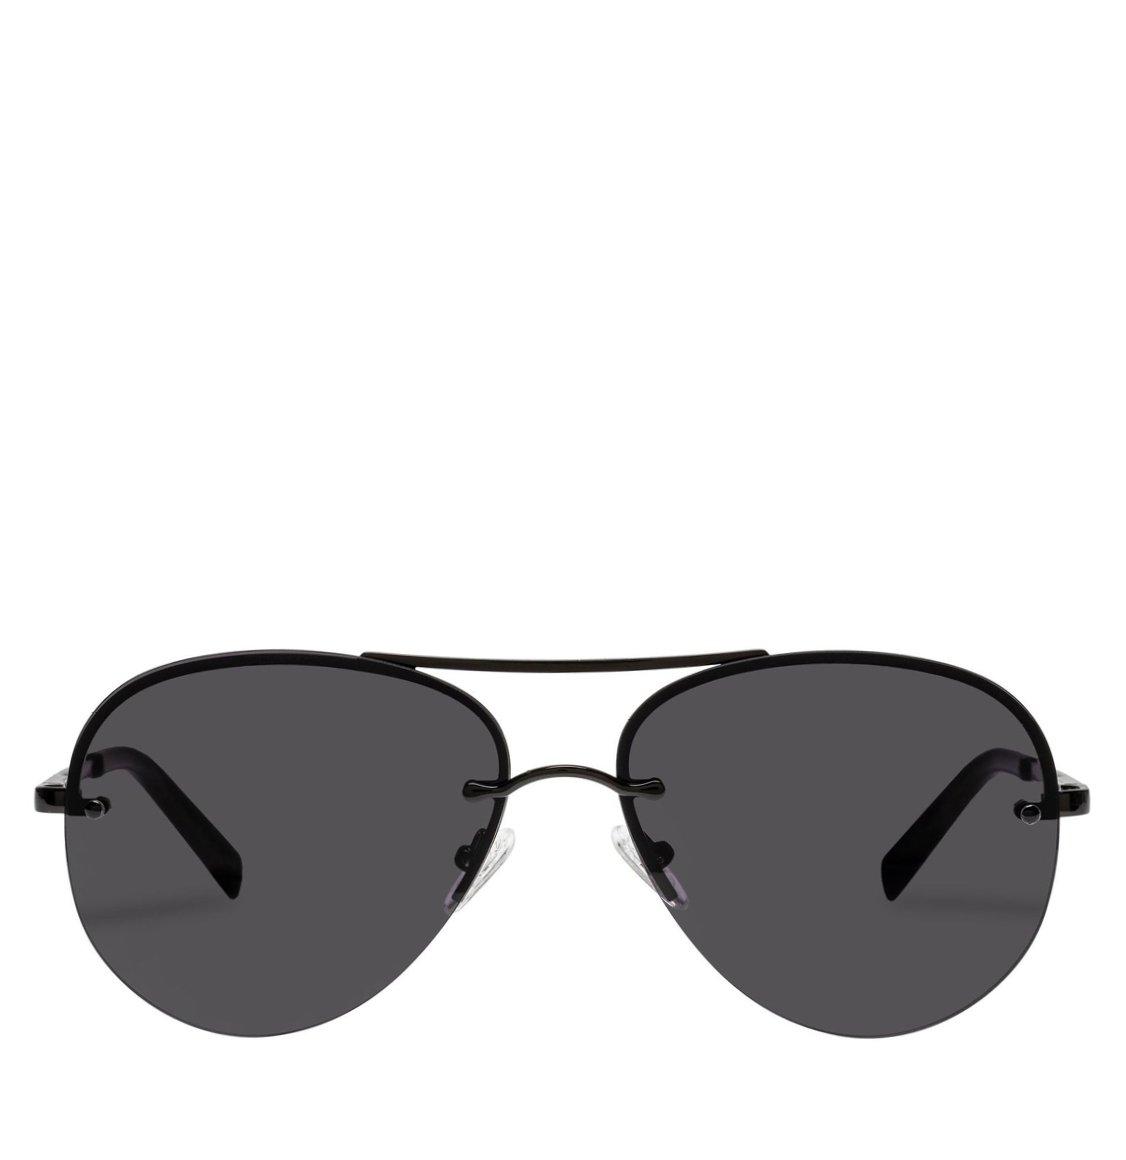 Le Specs Aviator Black Γυαλιά Ηλίου